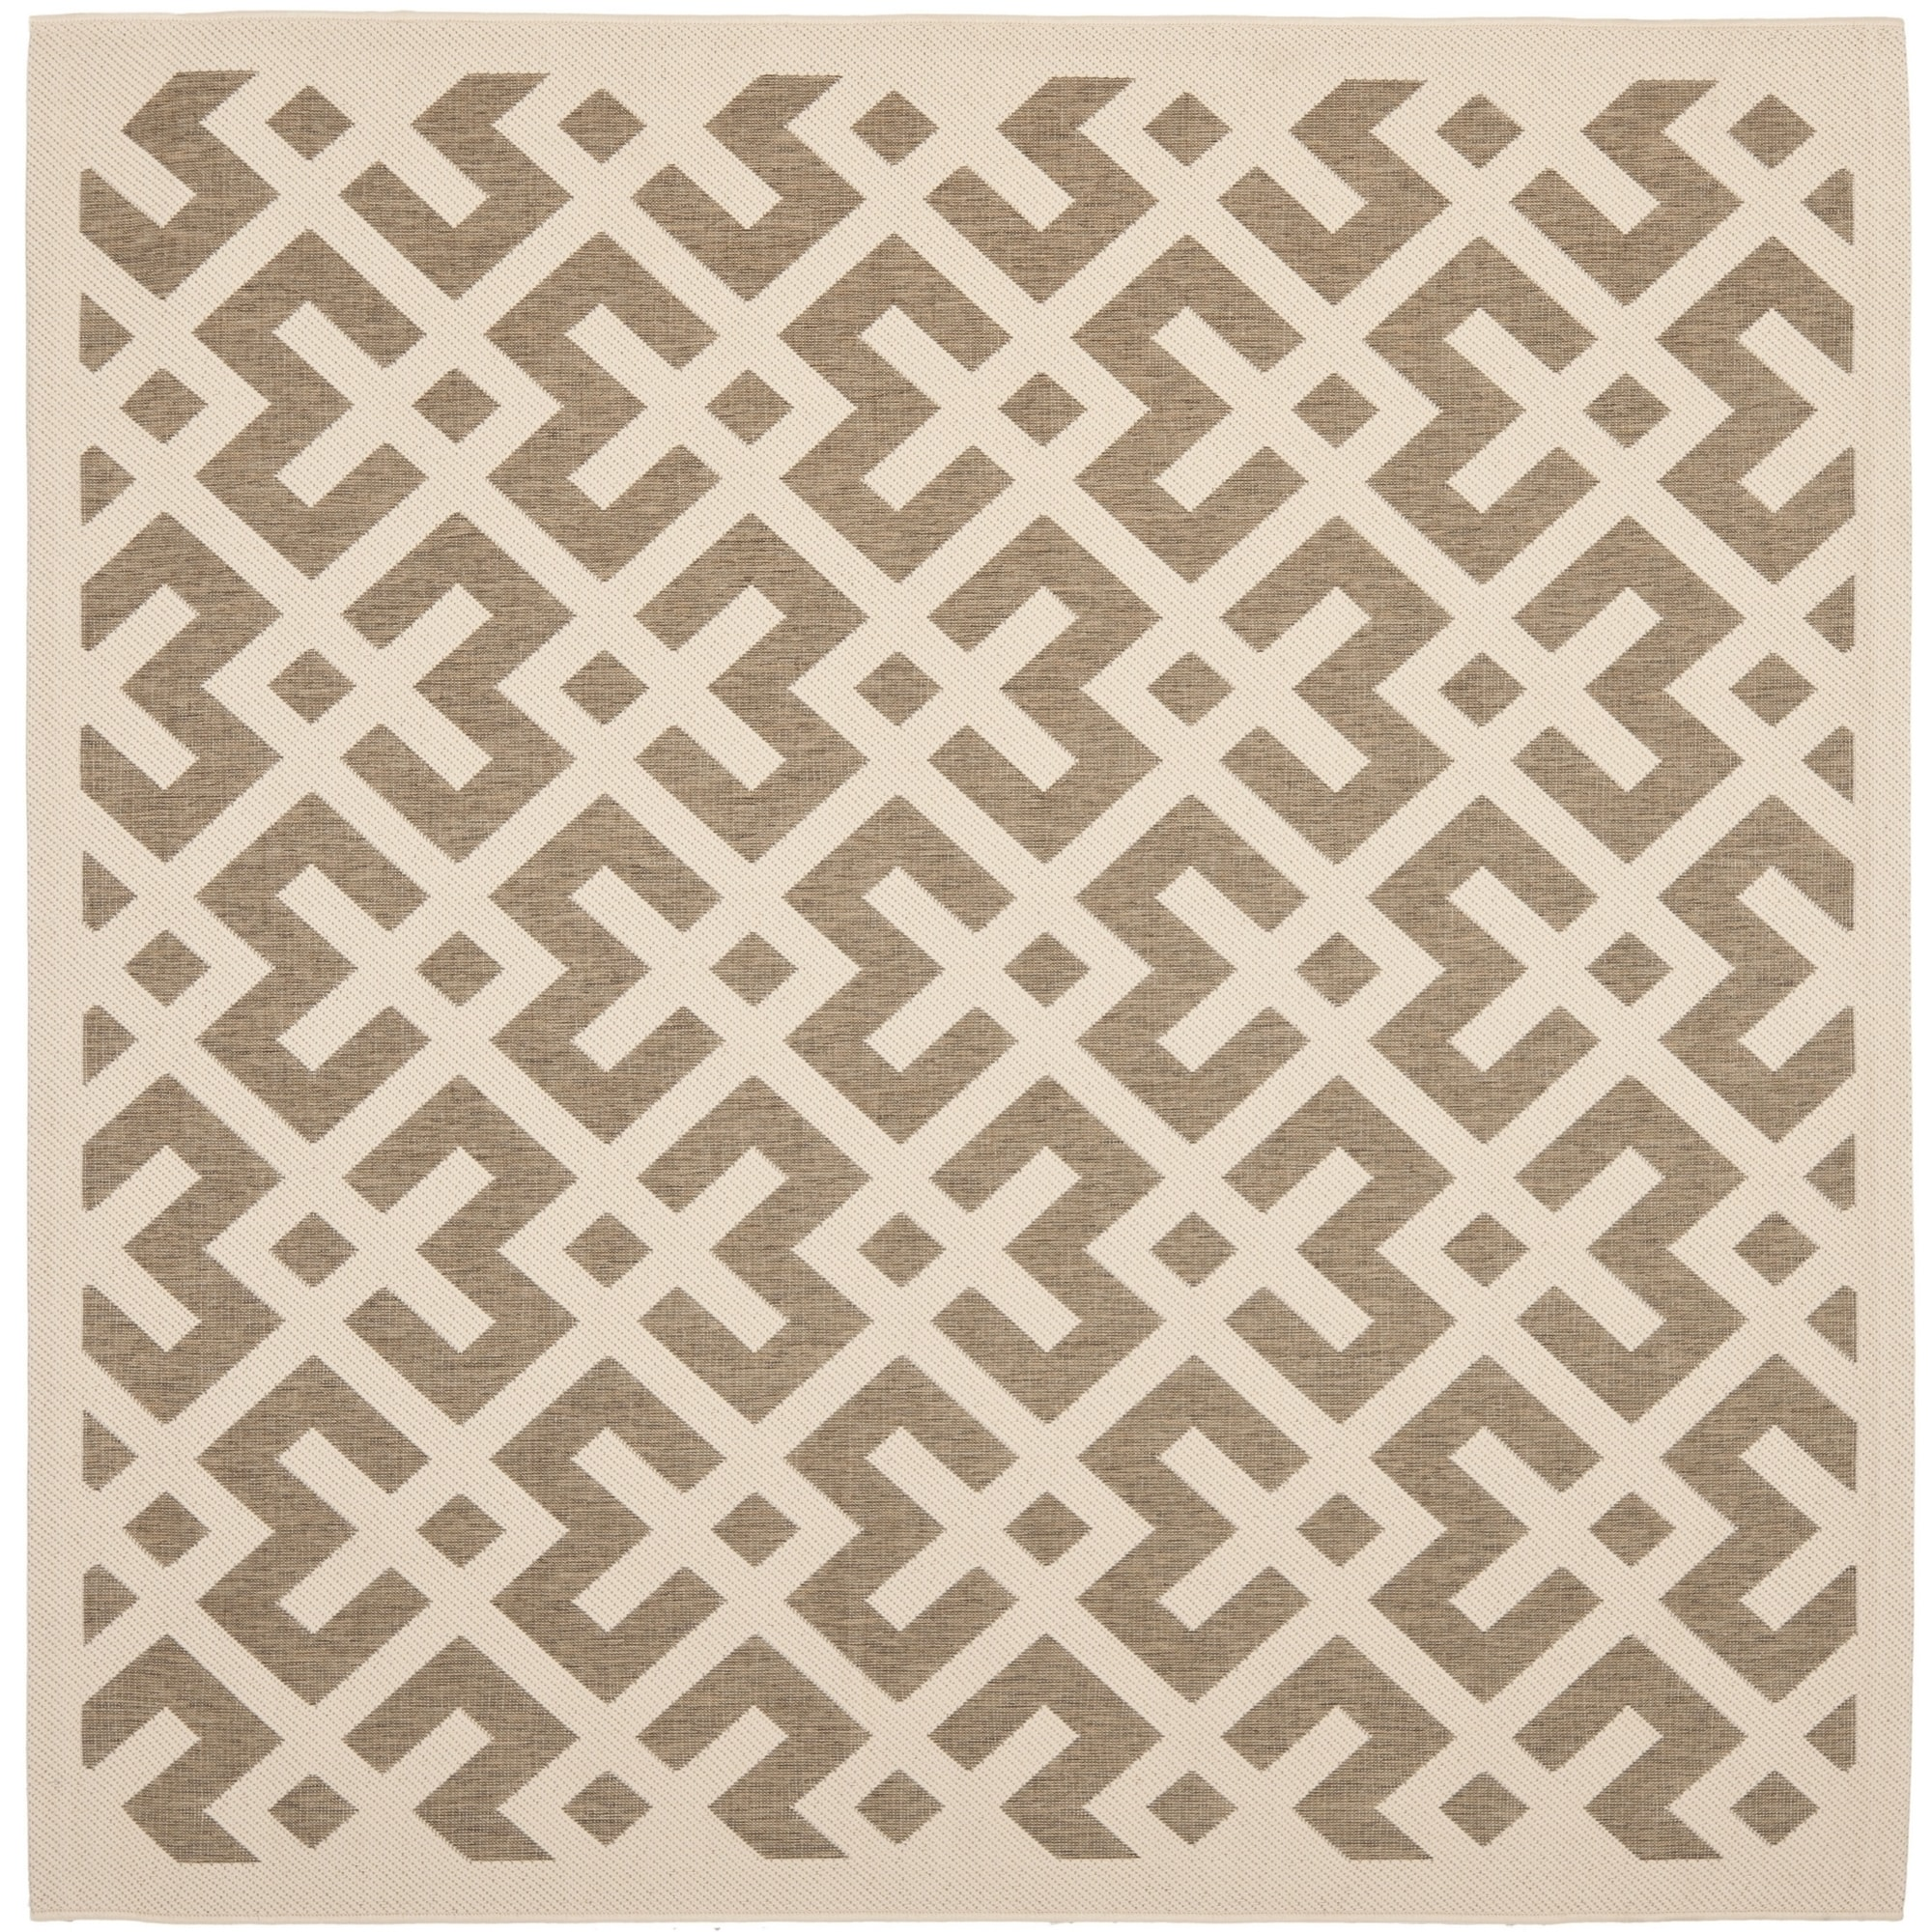 Safavieh Indoor/ Outdoor Courtyard Brown/ Bone Polypropylene Rug (53 Square)